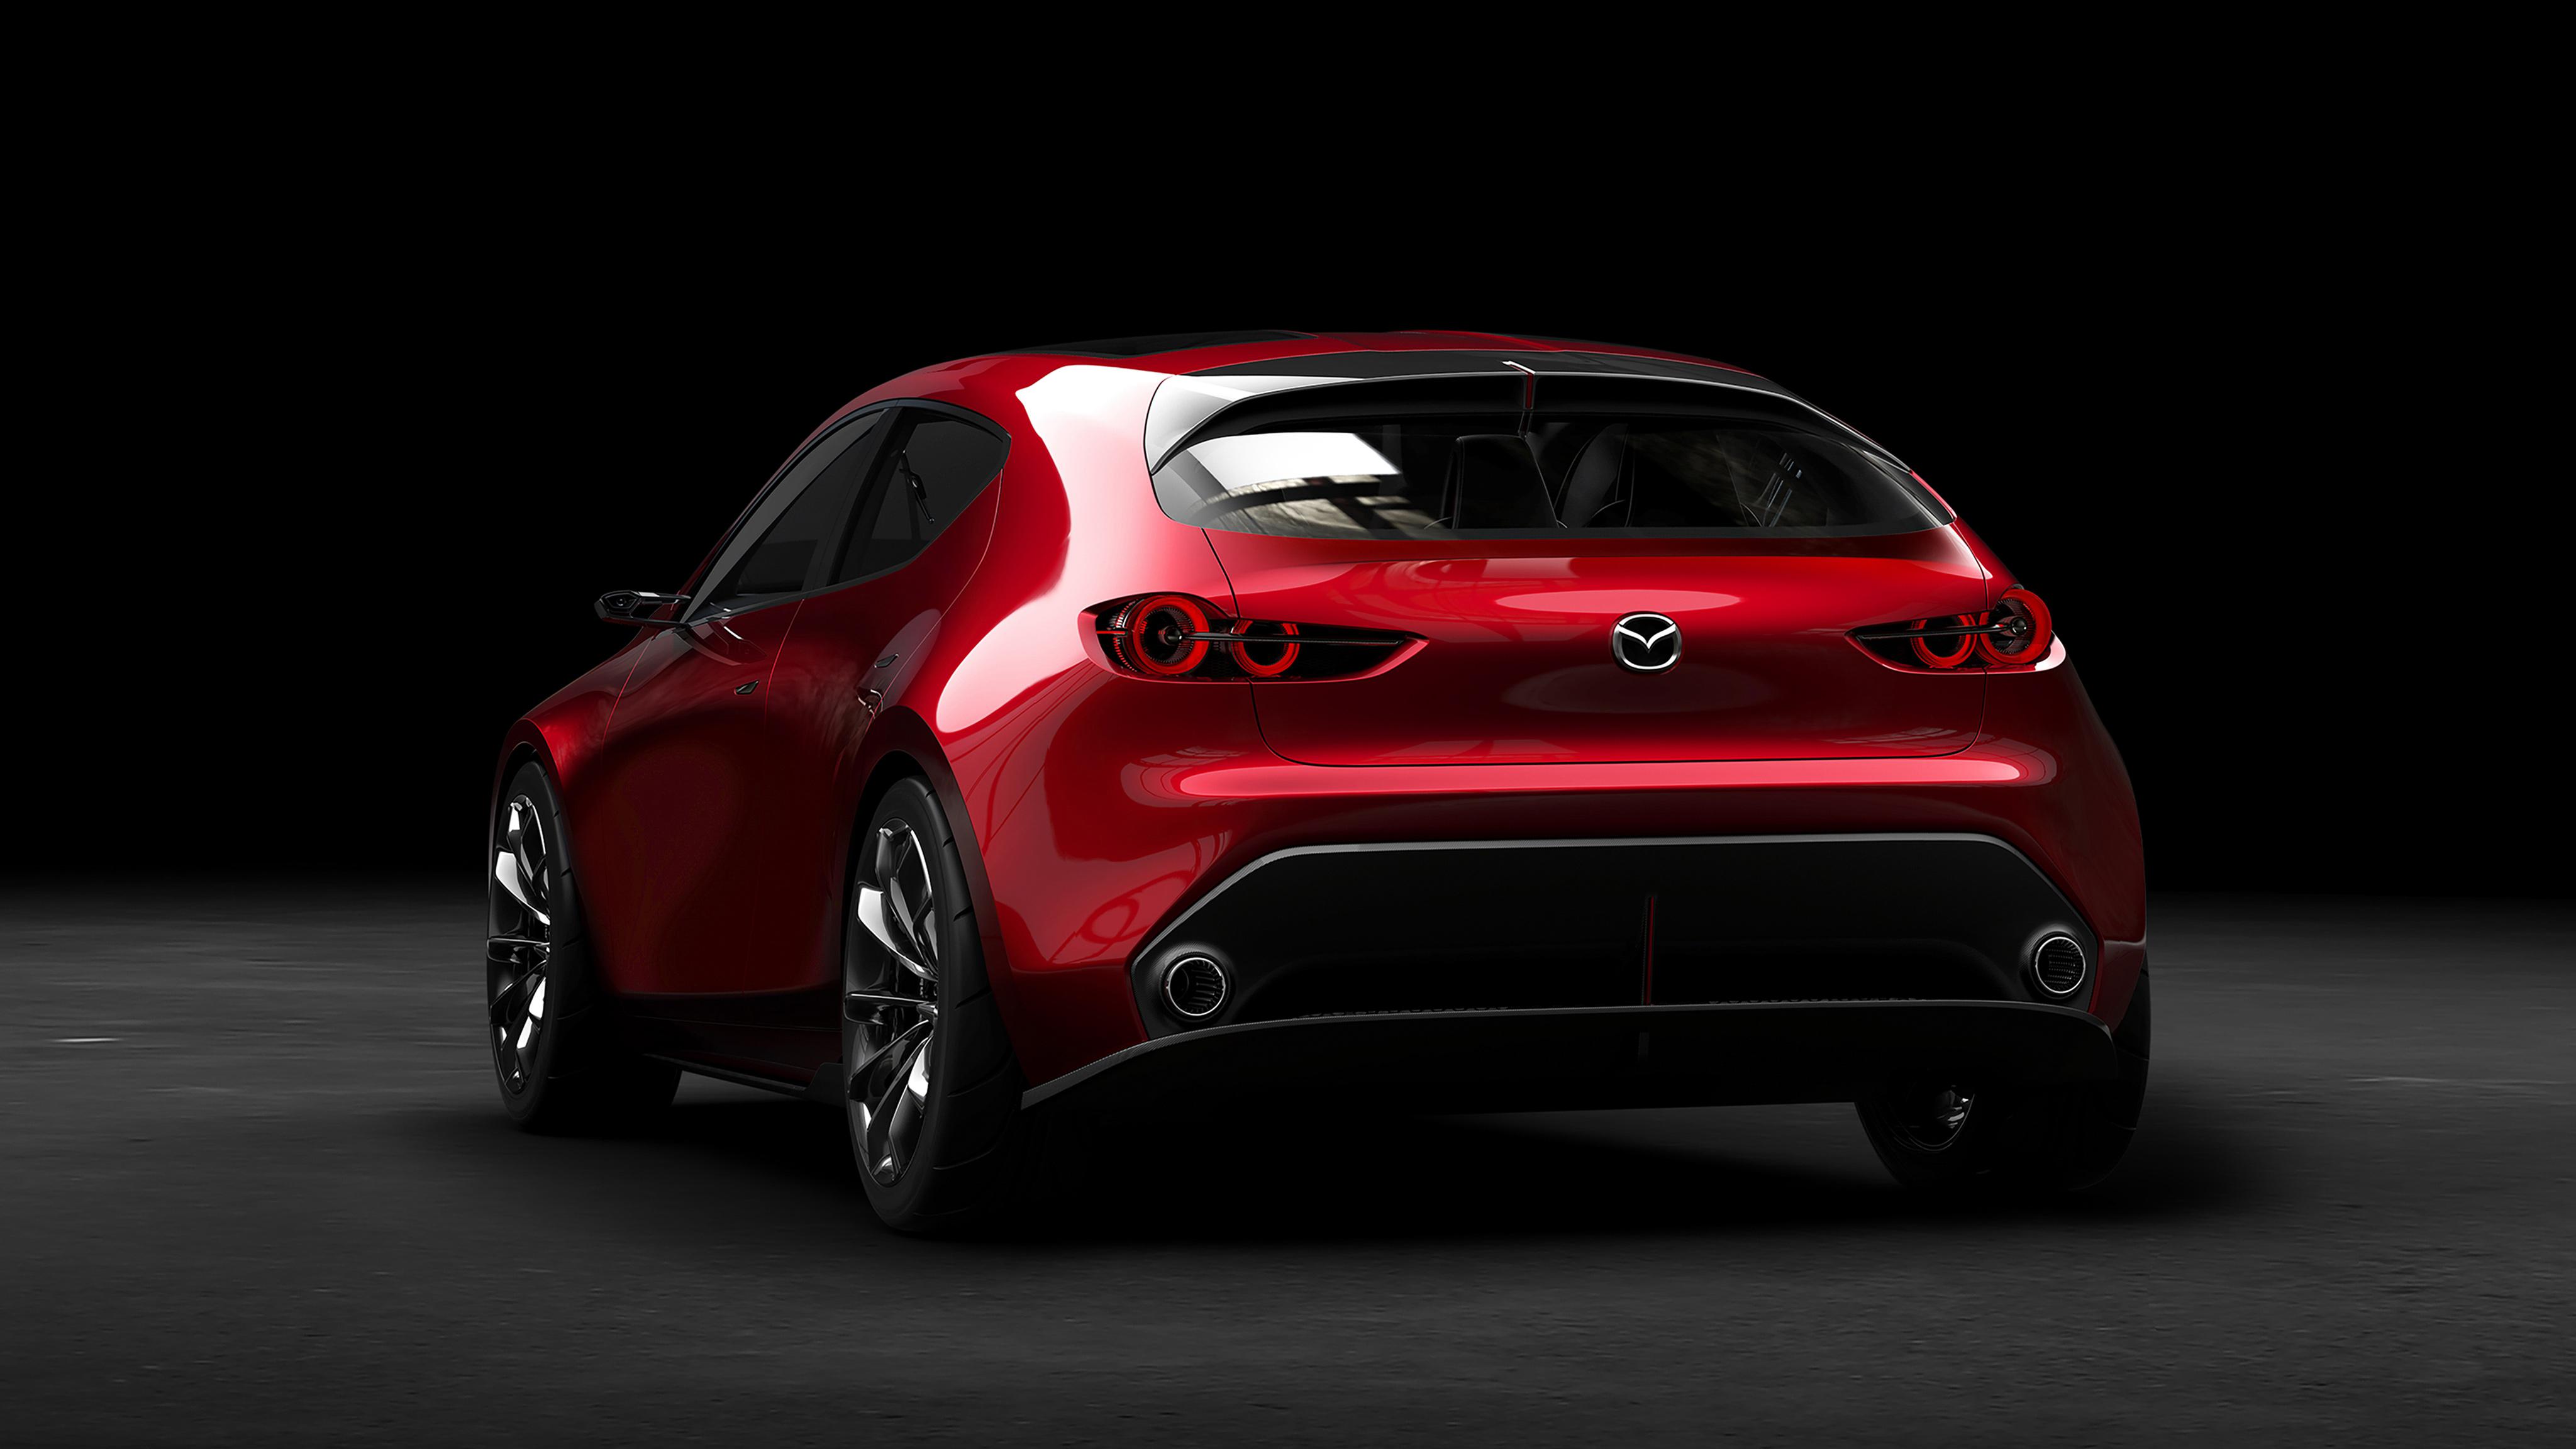 Acura Sedan 2017 >> 2017 Mazda Kai Concept 4K 2 Wallpaper | HD Car Wallpapers | ID #8899